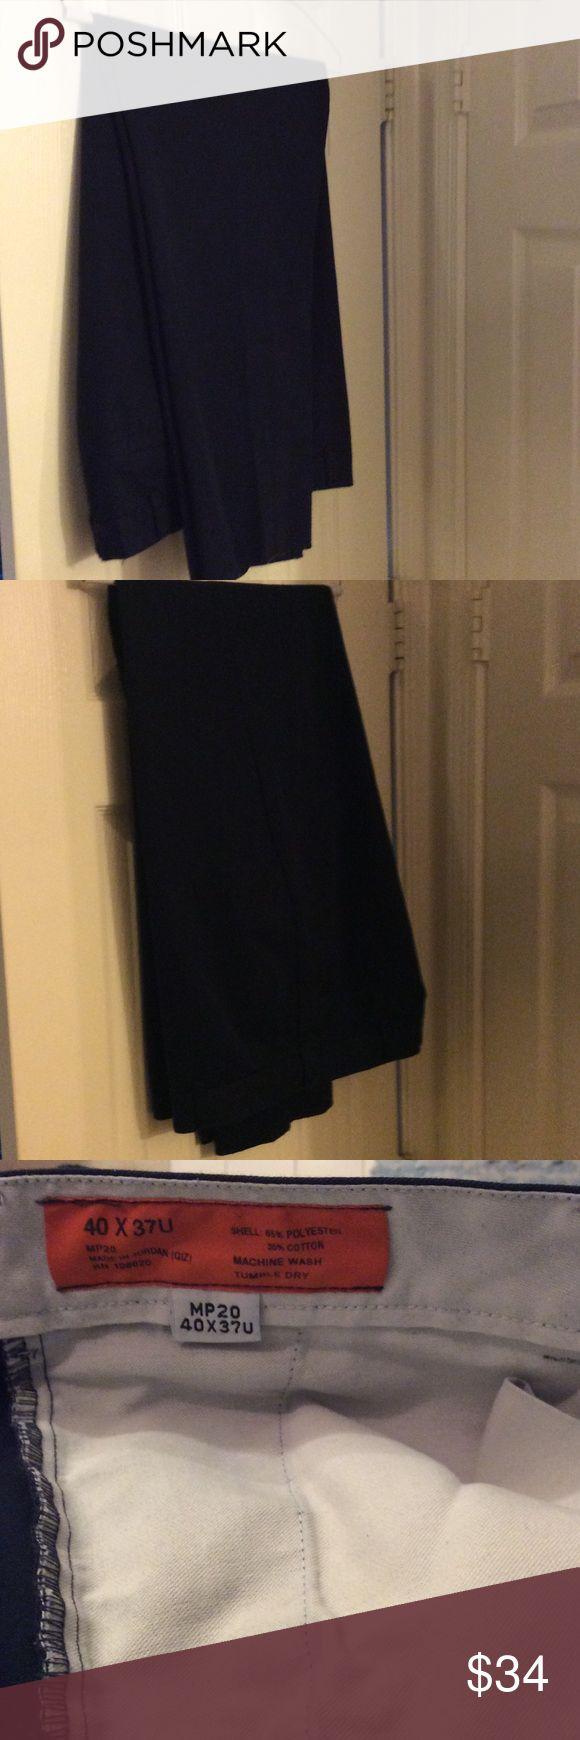 Men's work pants size 40 X 37U Like in New condition. Dark blue, work pants. made in Jordan. Size 40X 37 U n/a Pants